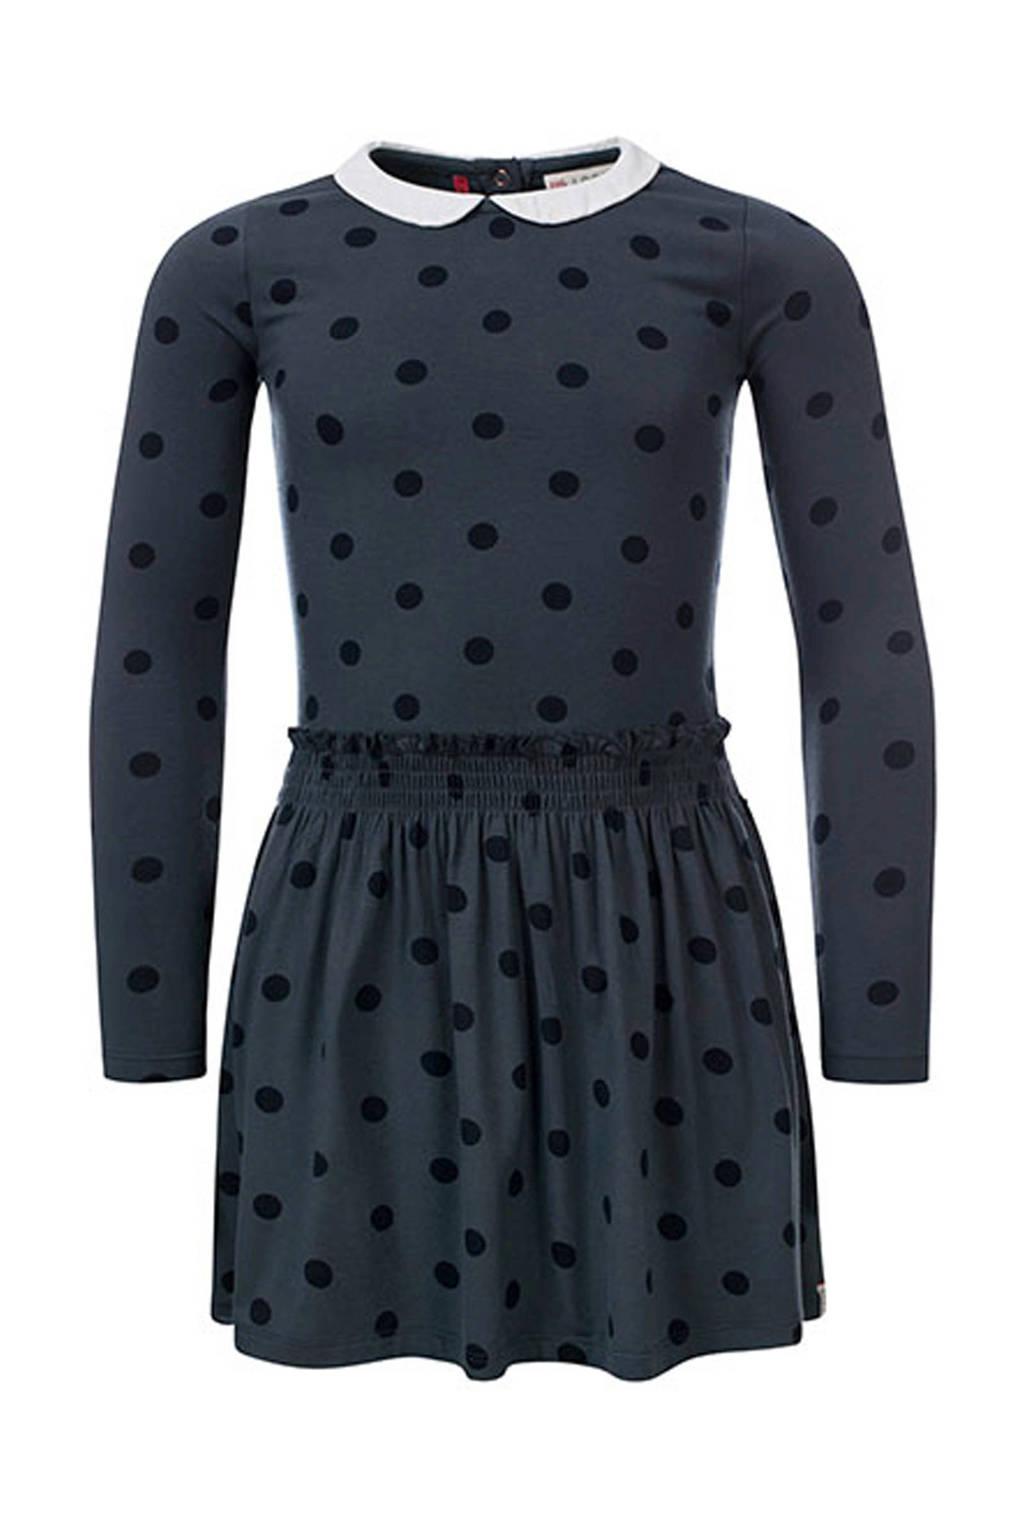 LOOXS Little jurk met stippen donkerblauw, Donkerblauw